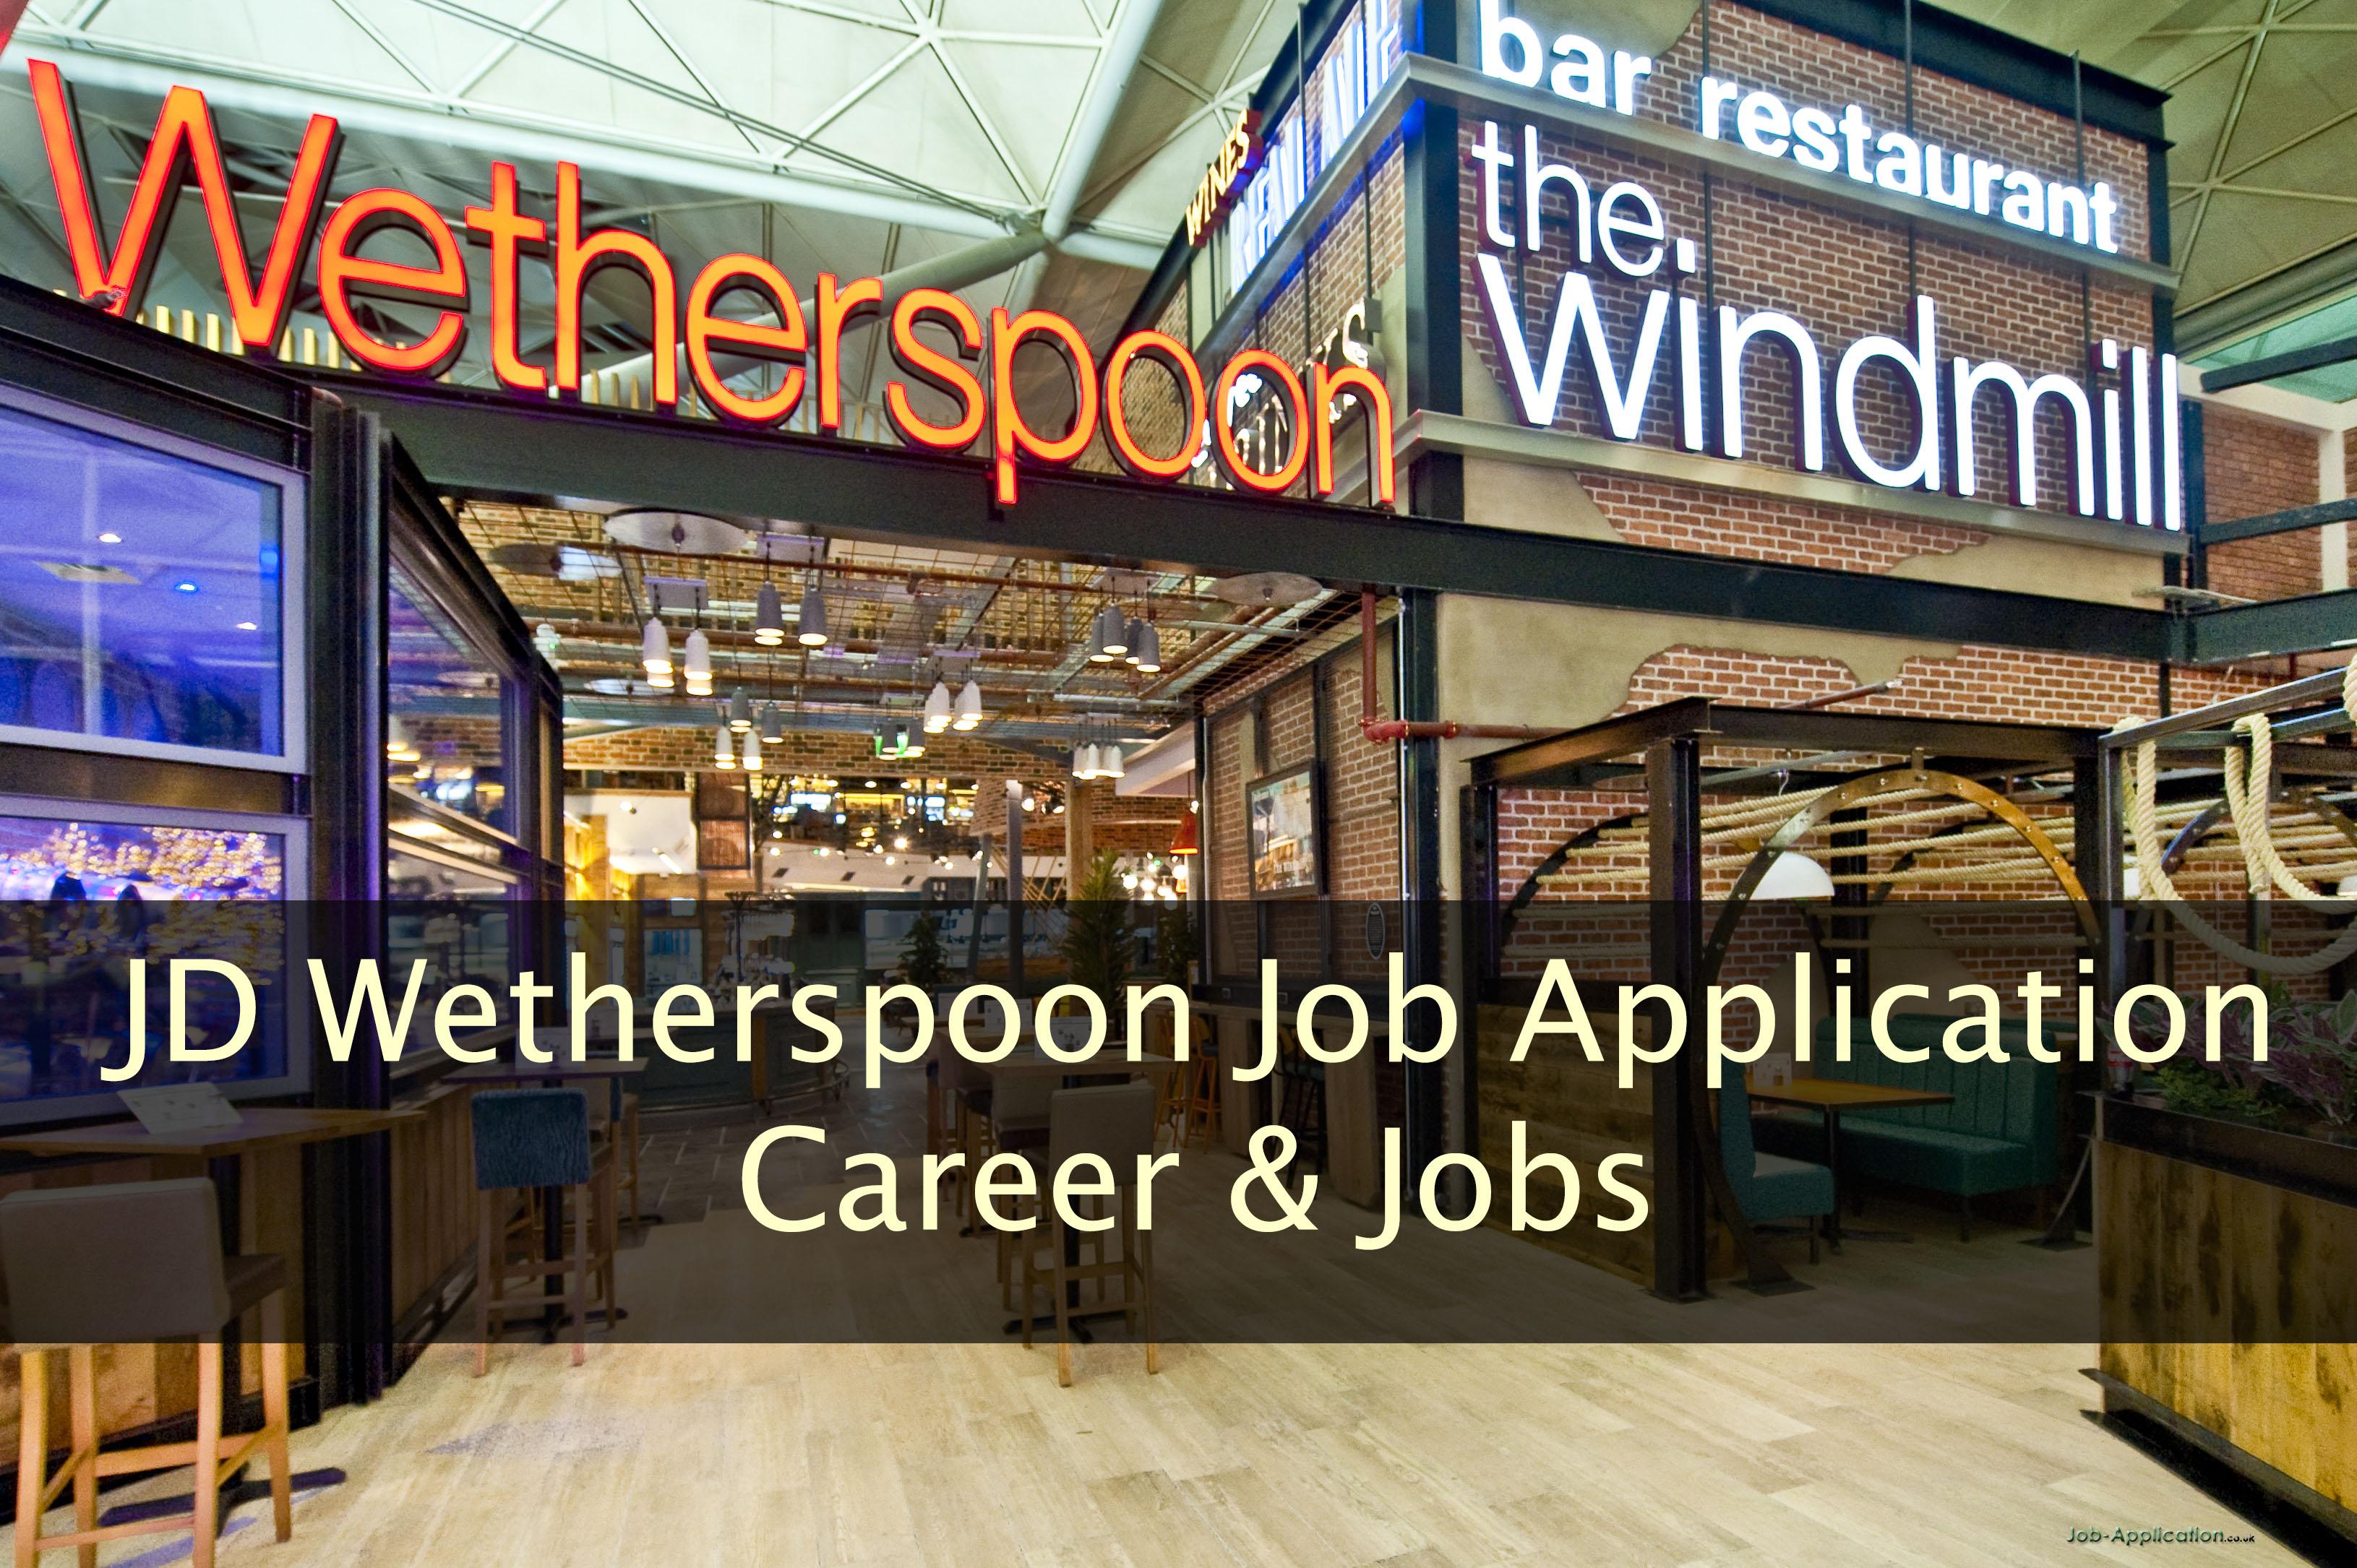 JD Wetherspoon Job application